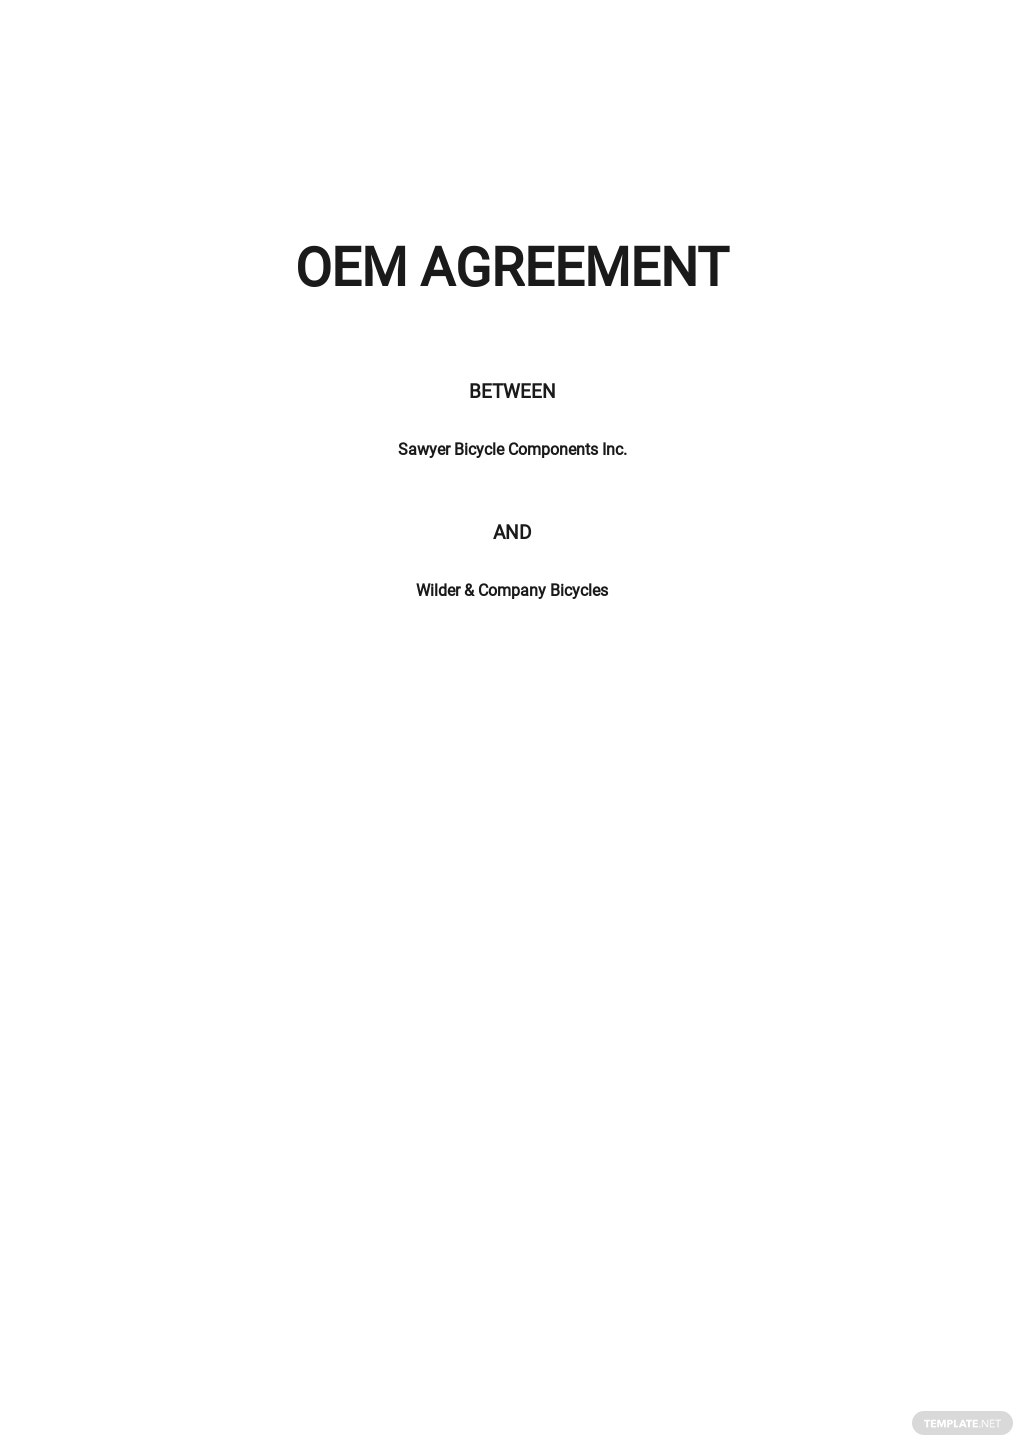 OEM Agreement Template